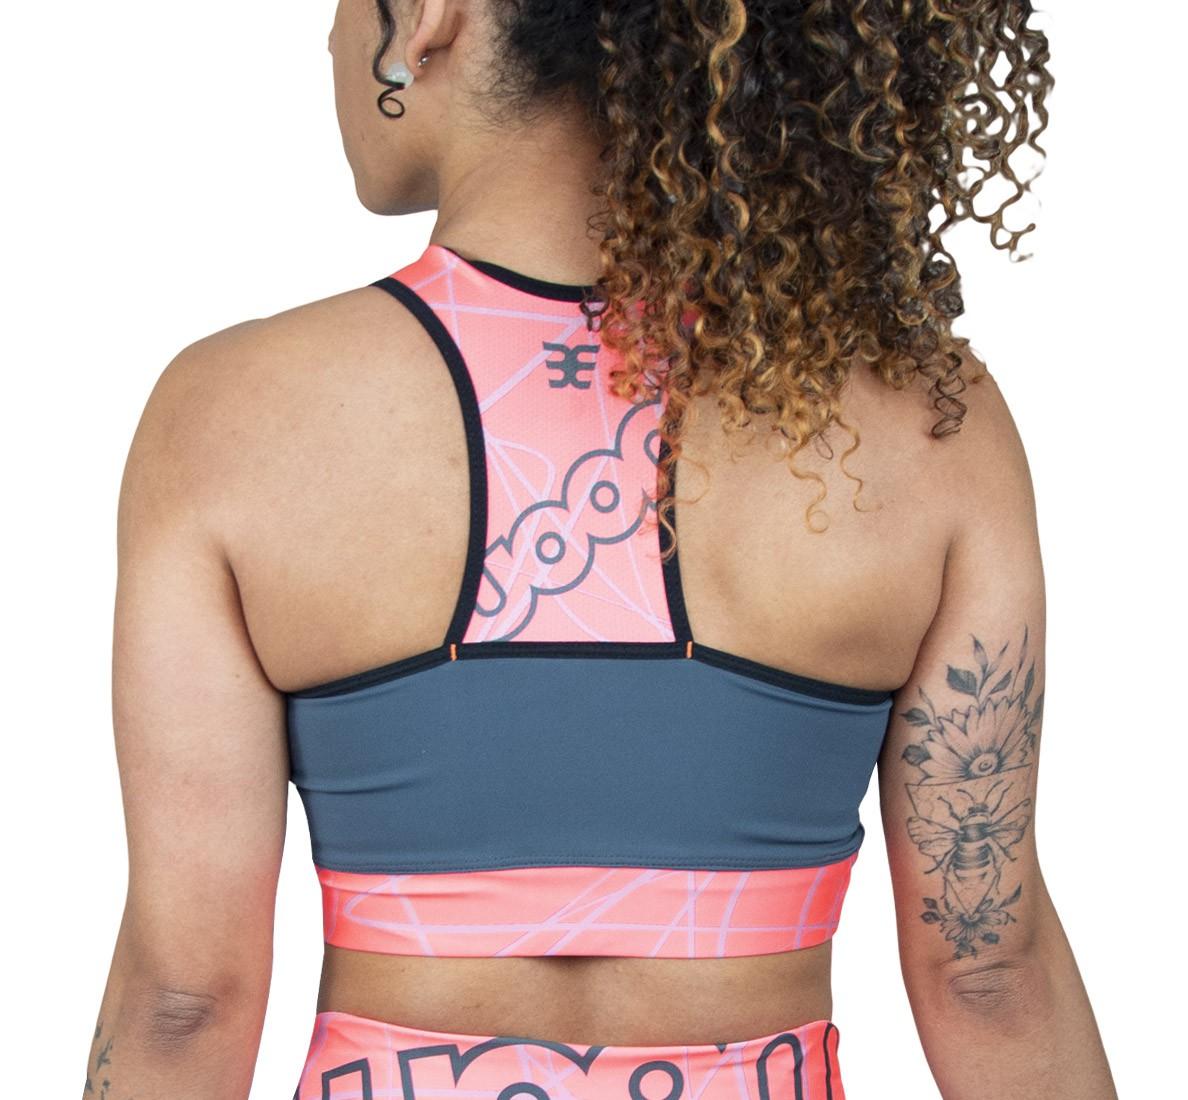 Top Running (Ed Ltda) X-fit Rosa Fem 2021